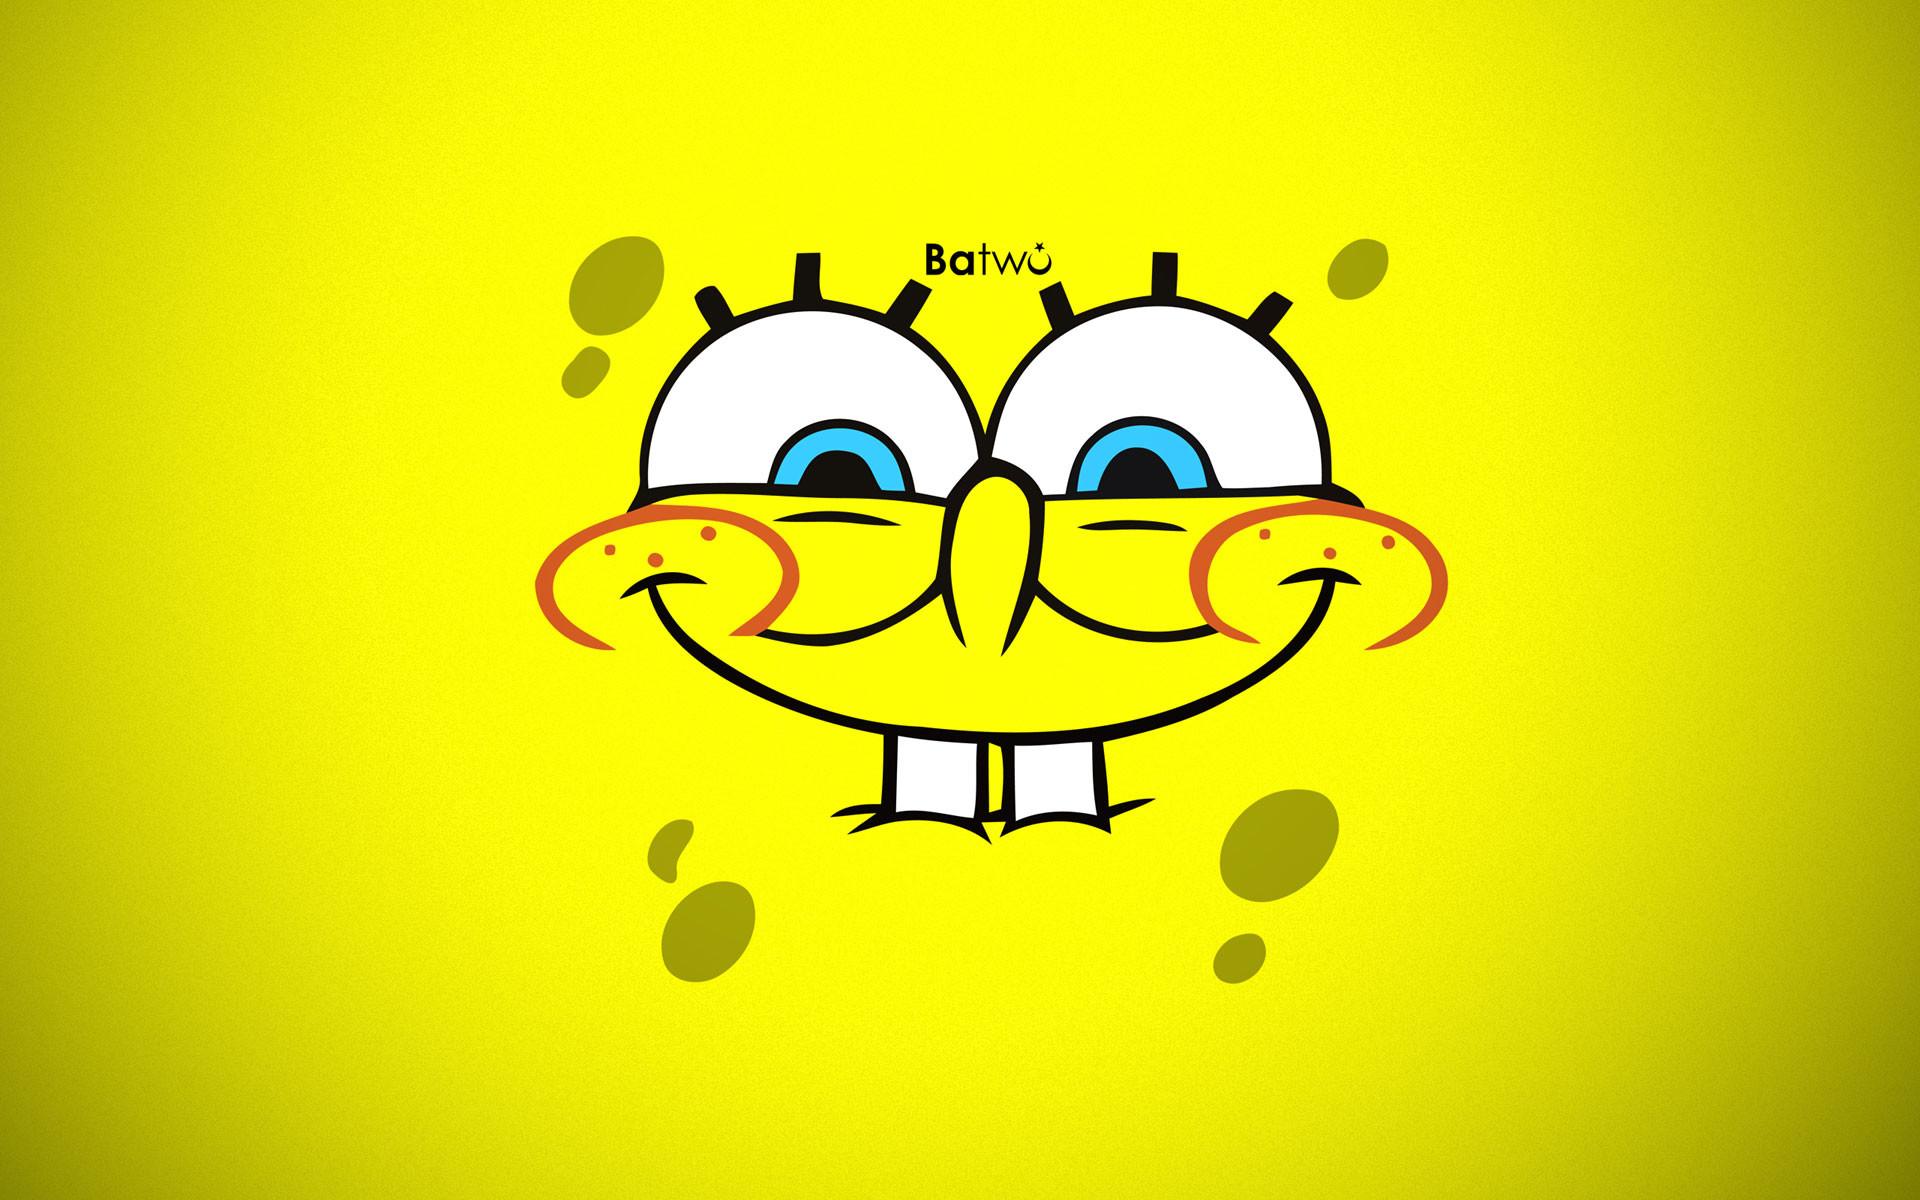 Spongebob Wallpaper Spongebob Wallpaper Spongebob Wallpaper Spongebob  Wallpaper Spongebob Wallpaper Spongebob Wallpaper …